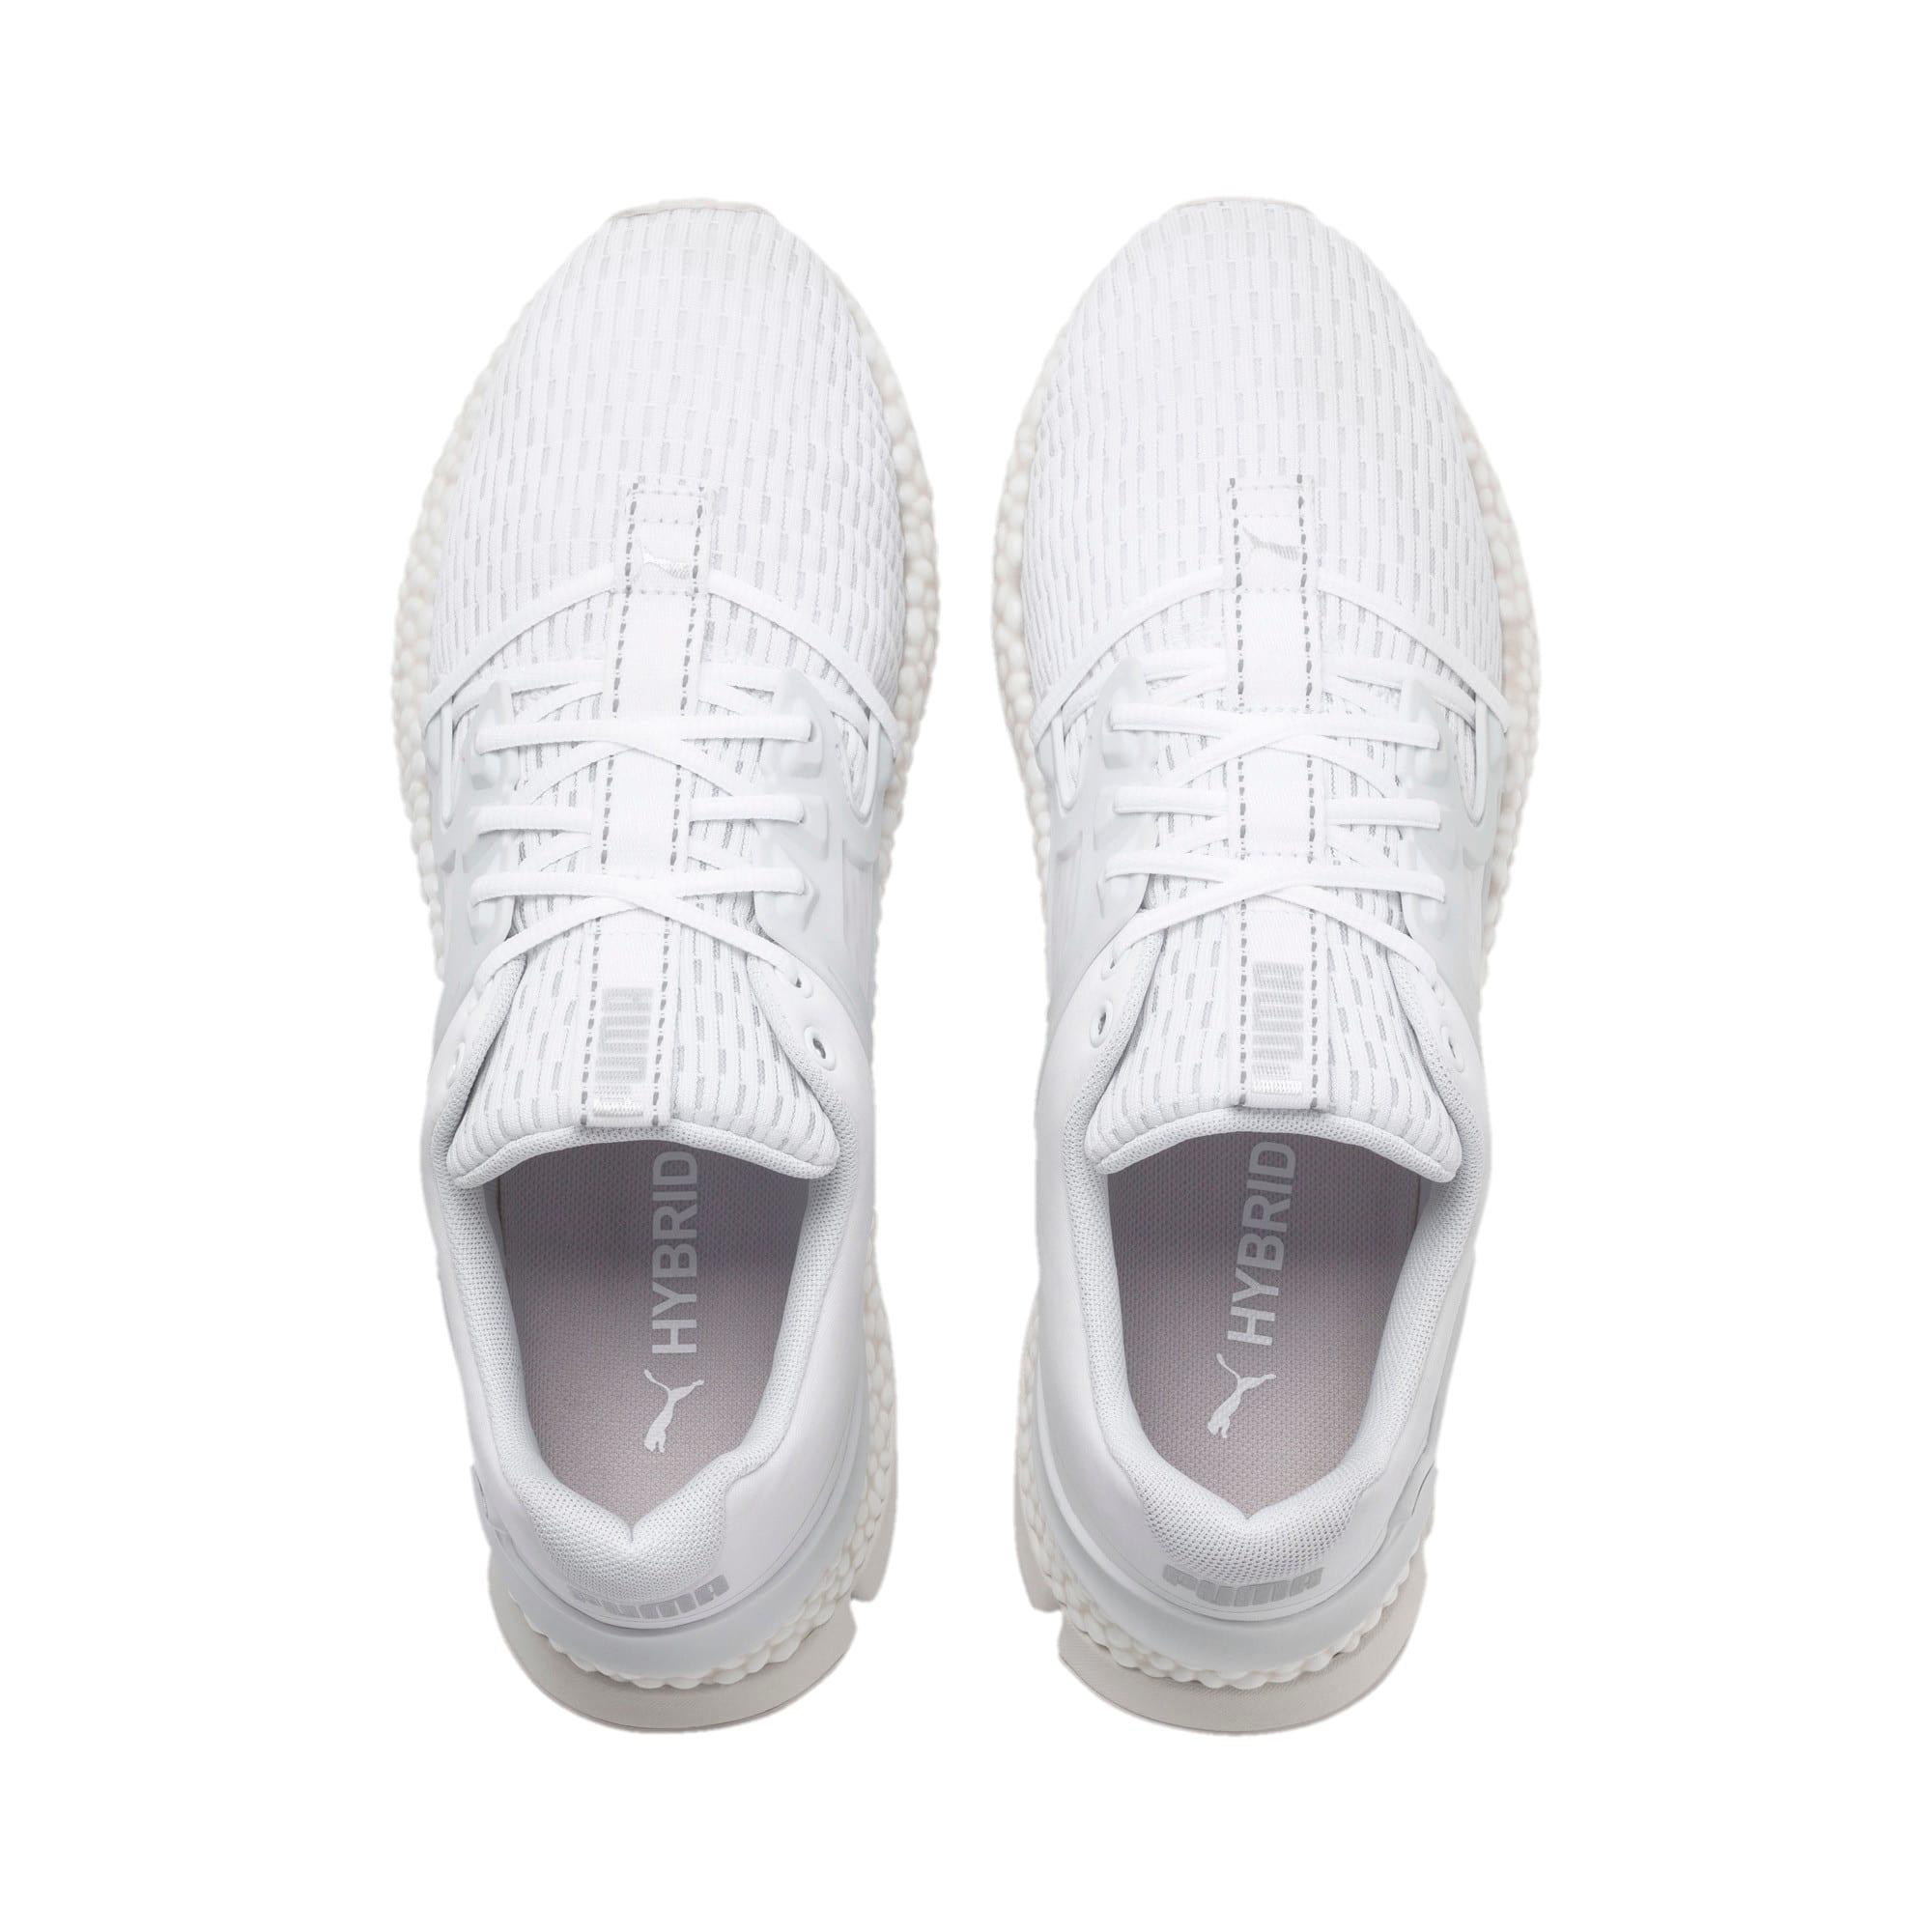 Thumbnail 7 of HYBRID Sky Lights Men's Running Shoes, Puma White-Puma Silver, medium